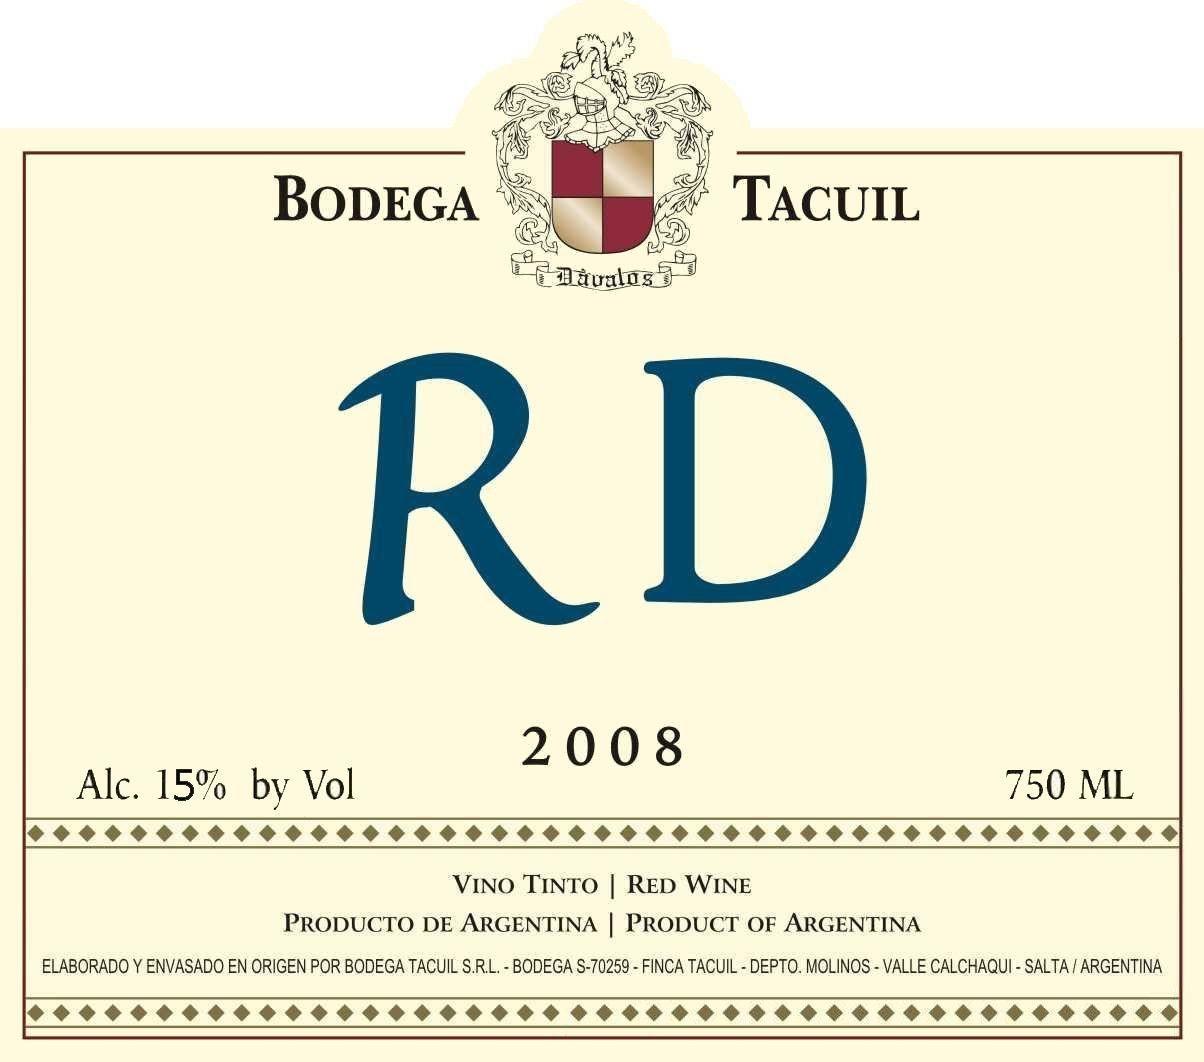 Bodega Tacuil RD 2008